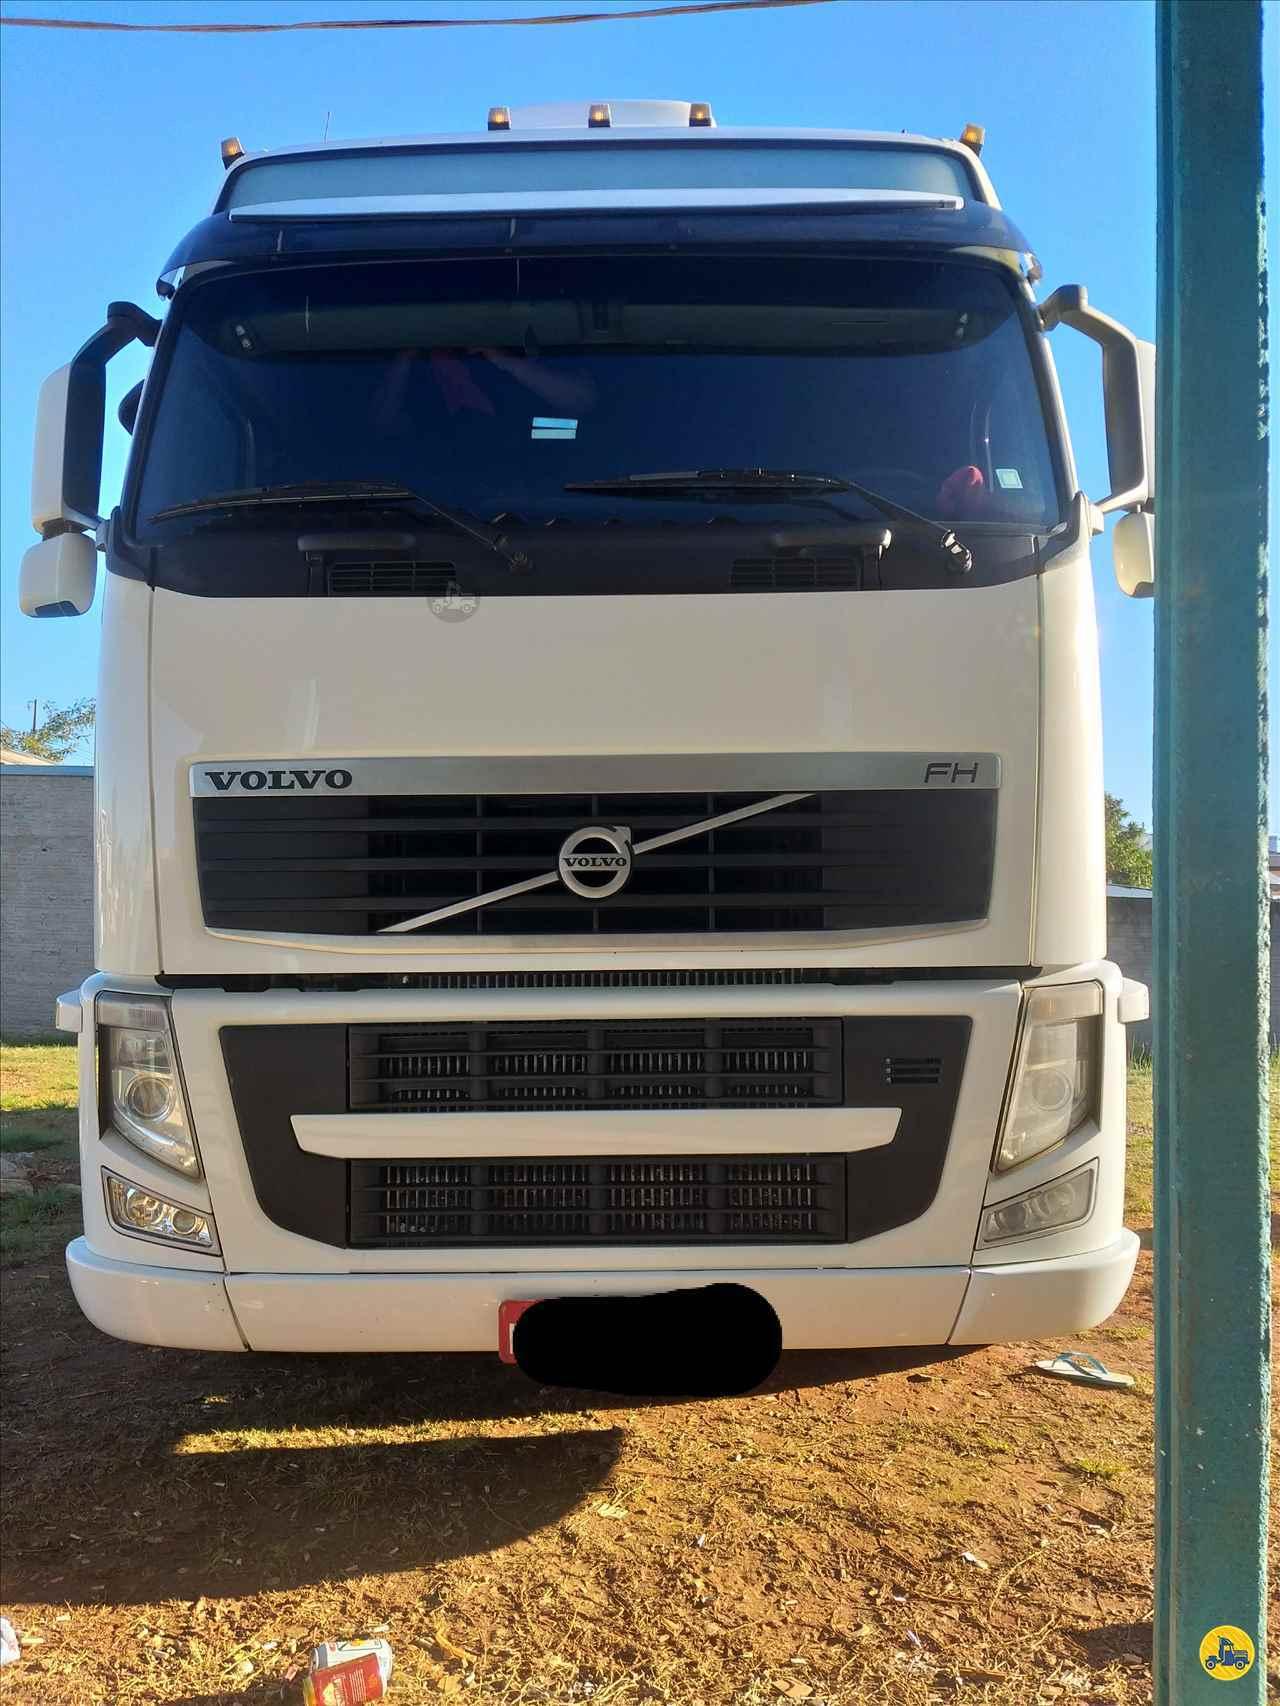 CAMINHAO VOLVO VOLVO FH 460 Cavalo Mecânico Truck 6x2 Faccin Logística  GUARAPUAVA PARANÁ PR